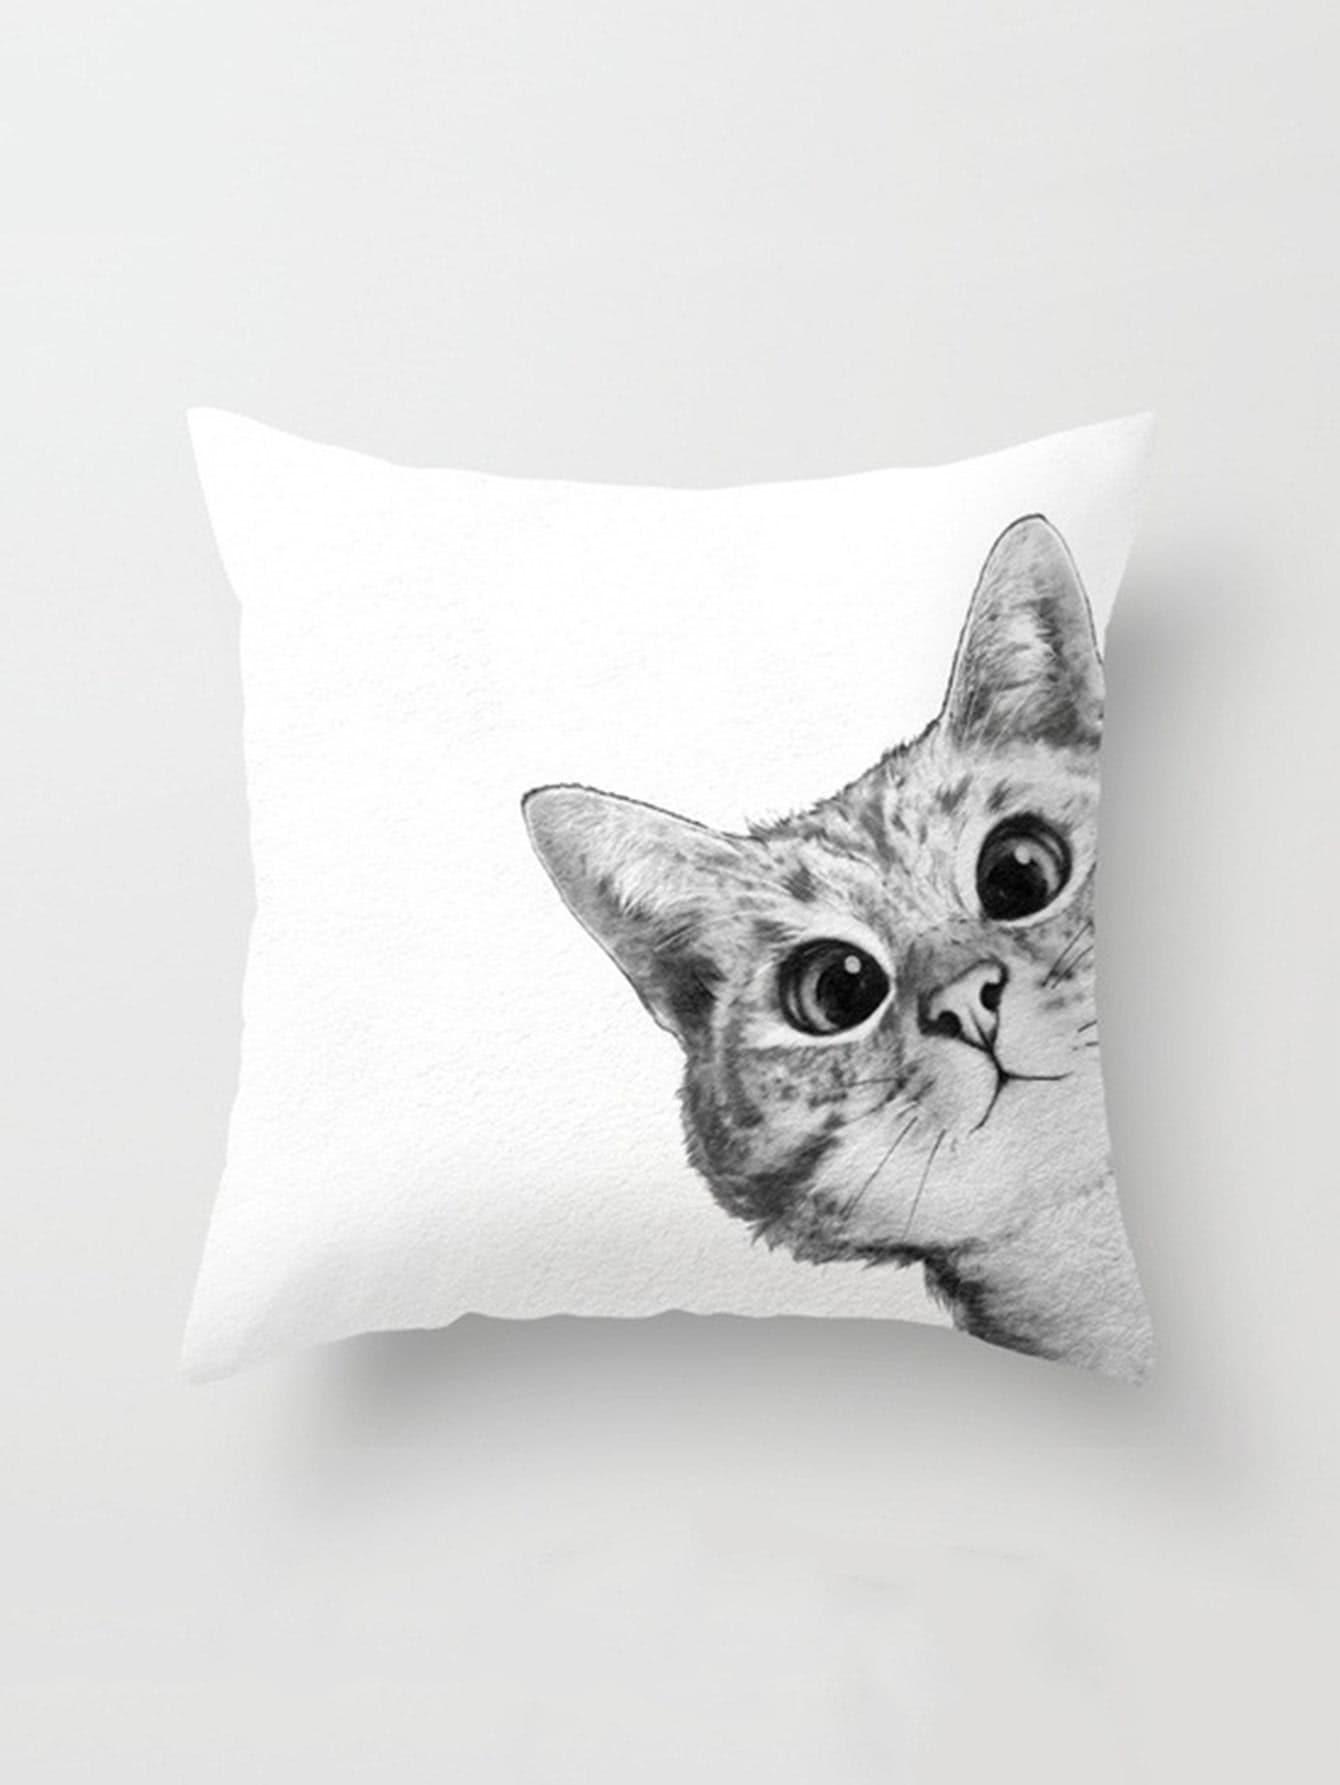 Cat Print Pillowcase Cover panda print linen pillowcase cover